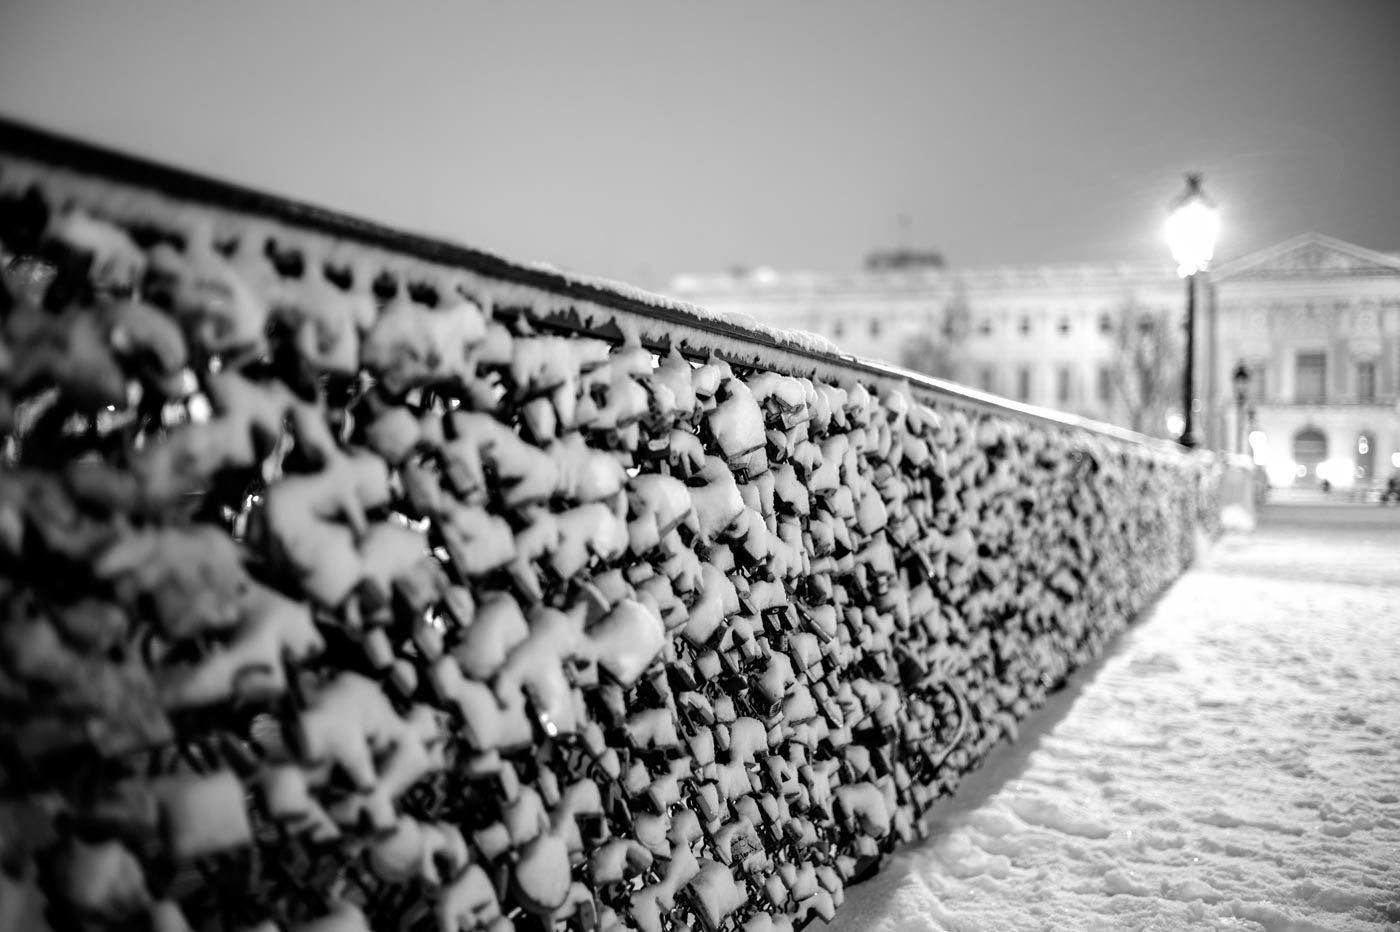 Snowy Lovers' Bridge